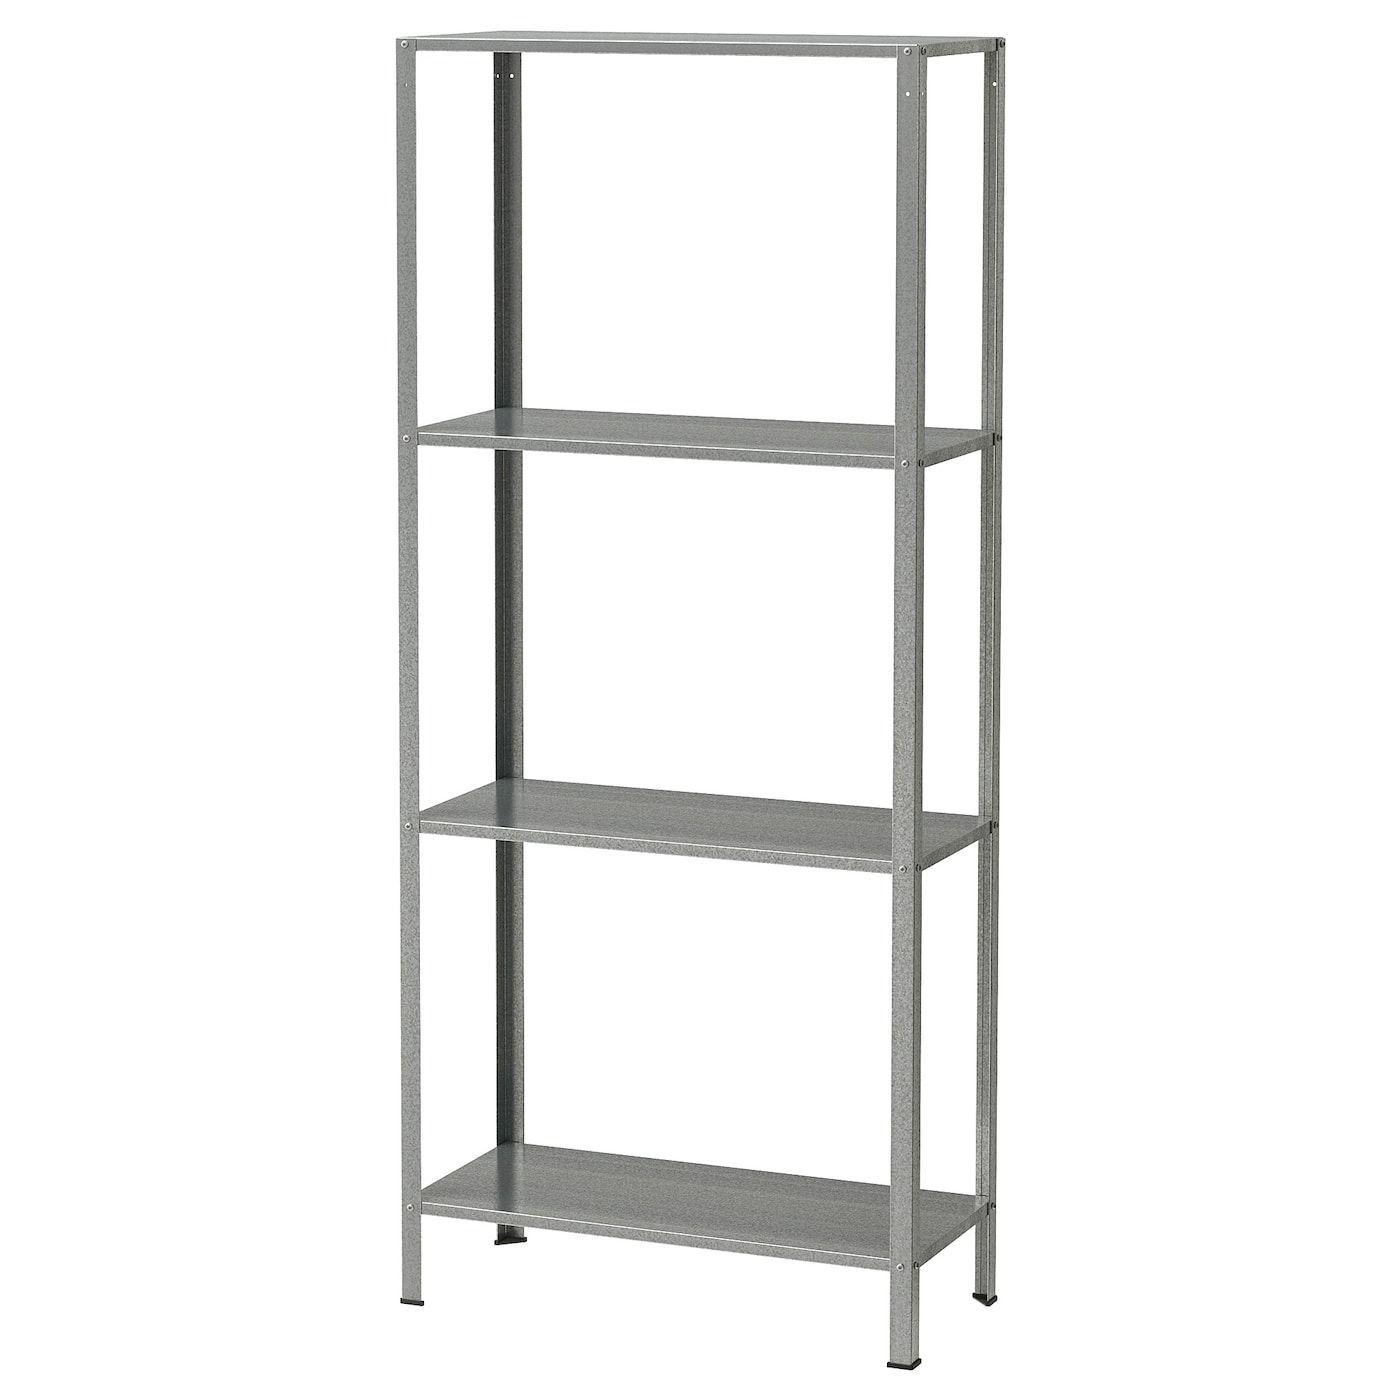 Armadio Metallico Esterno Ikea hyllis scaffale - da interno/esterno zincato 60x27x140 cm